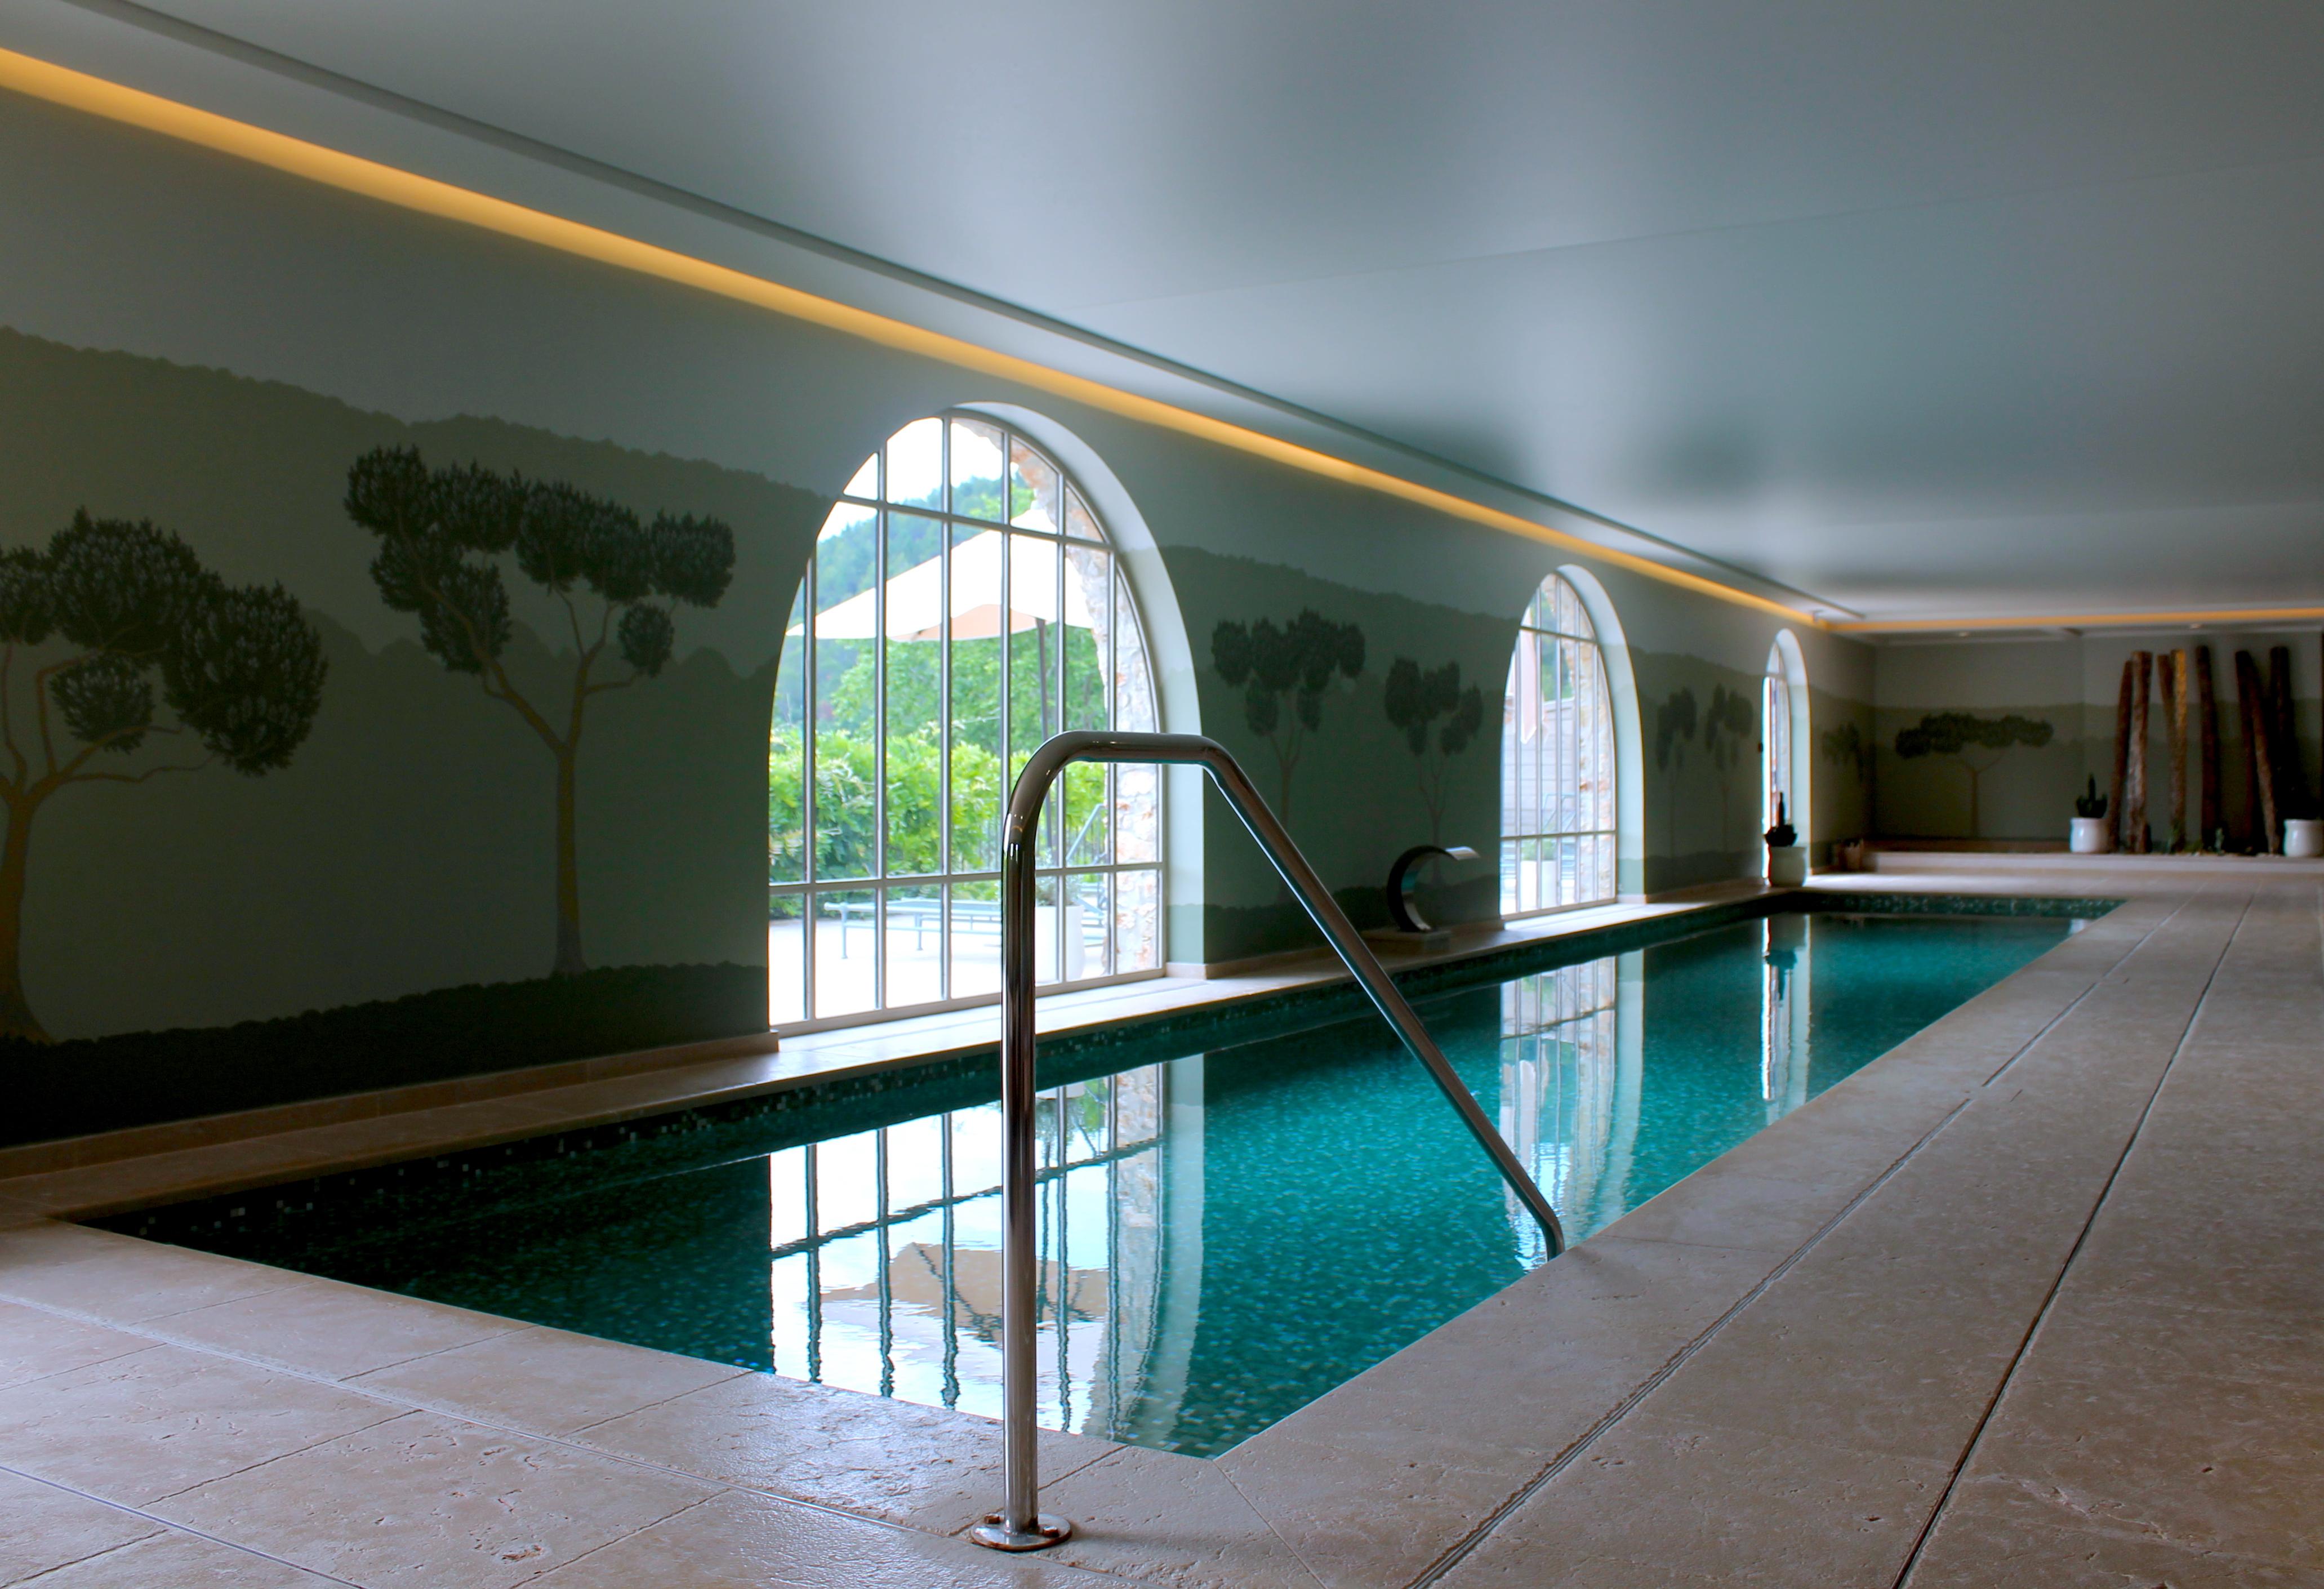 cinq-mondes-spa-chateaudeberne-lustforthesublime